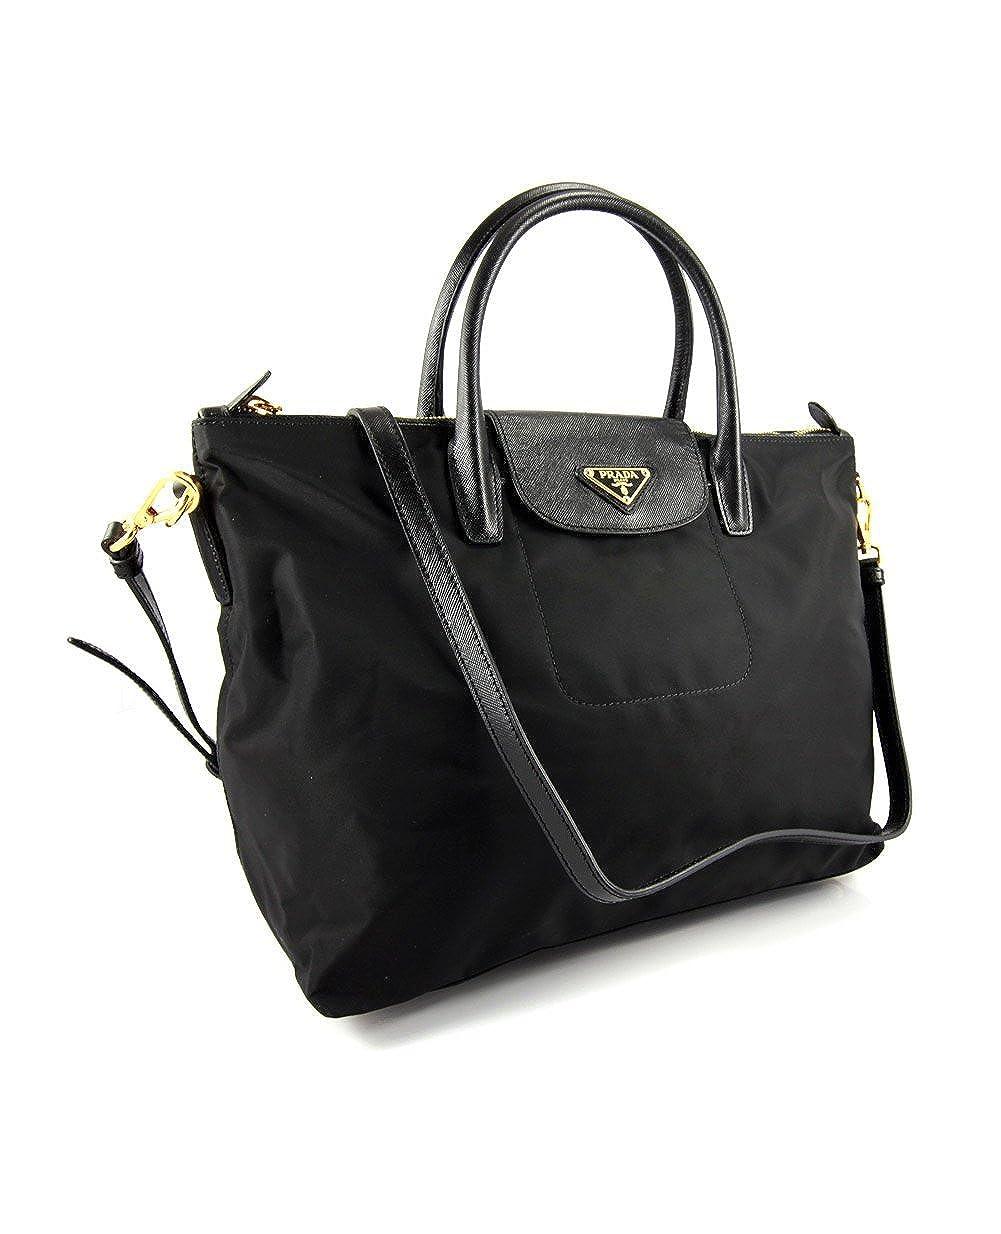 c0084736fd01 Prada BN2106 Nero Black Tessuto Saffian Nylon and Leather Shopping Tote  Bag: Amazon.ca: Shoes & Handbags